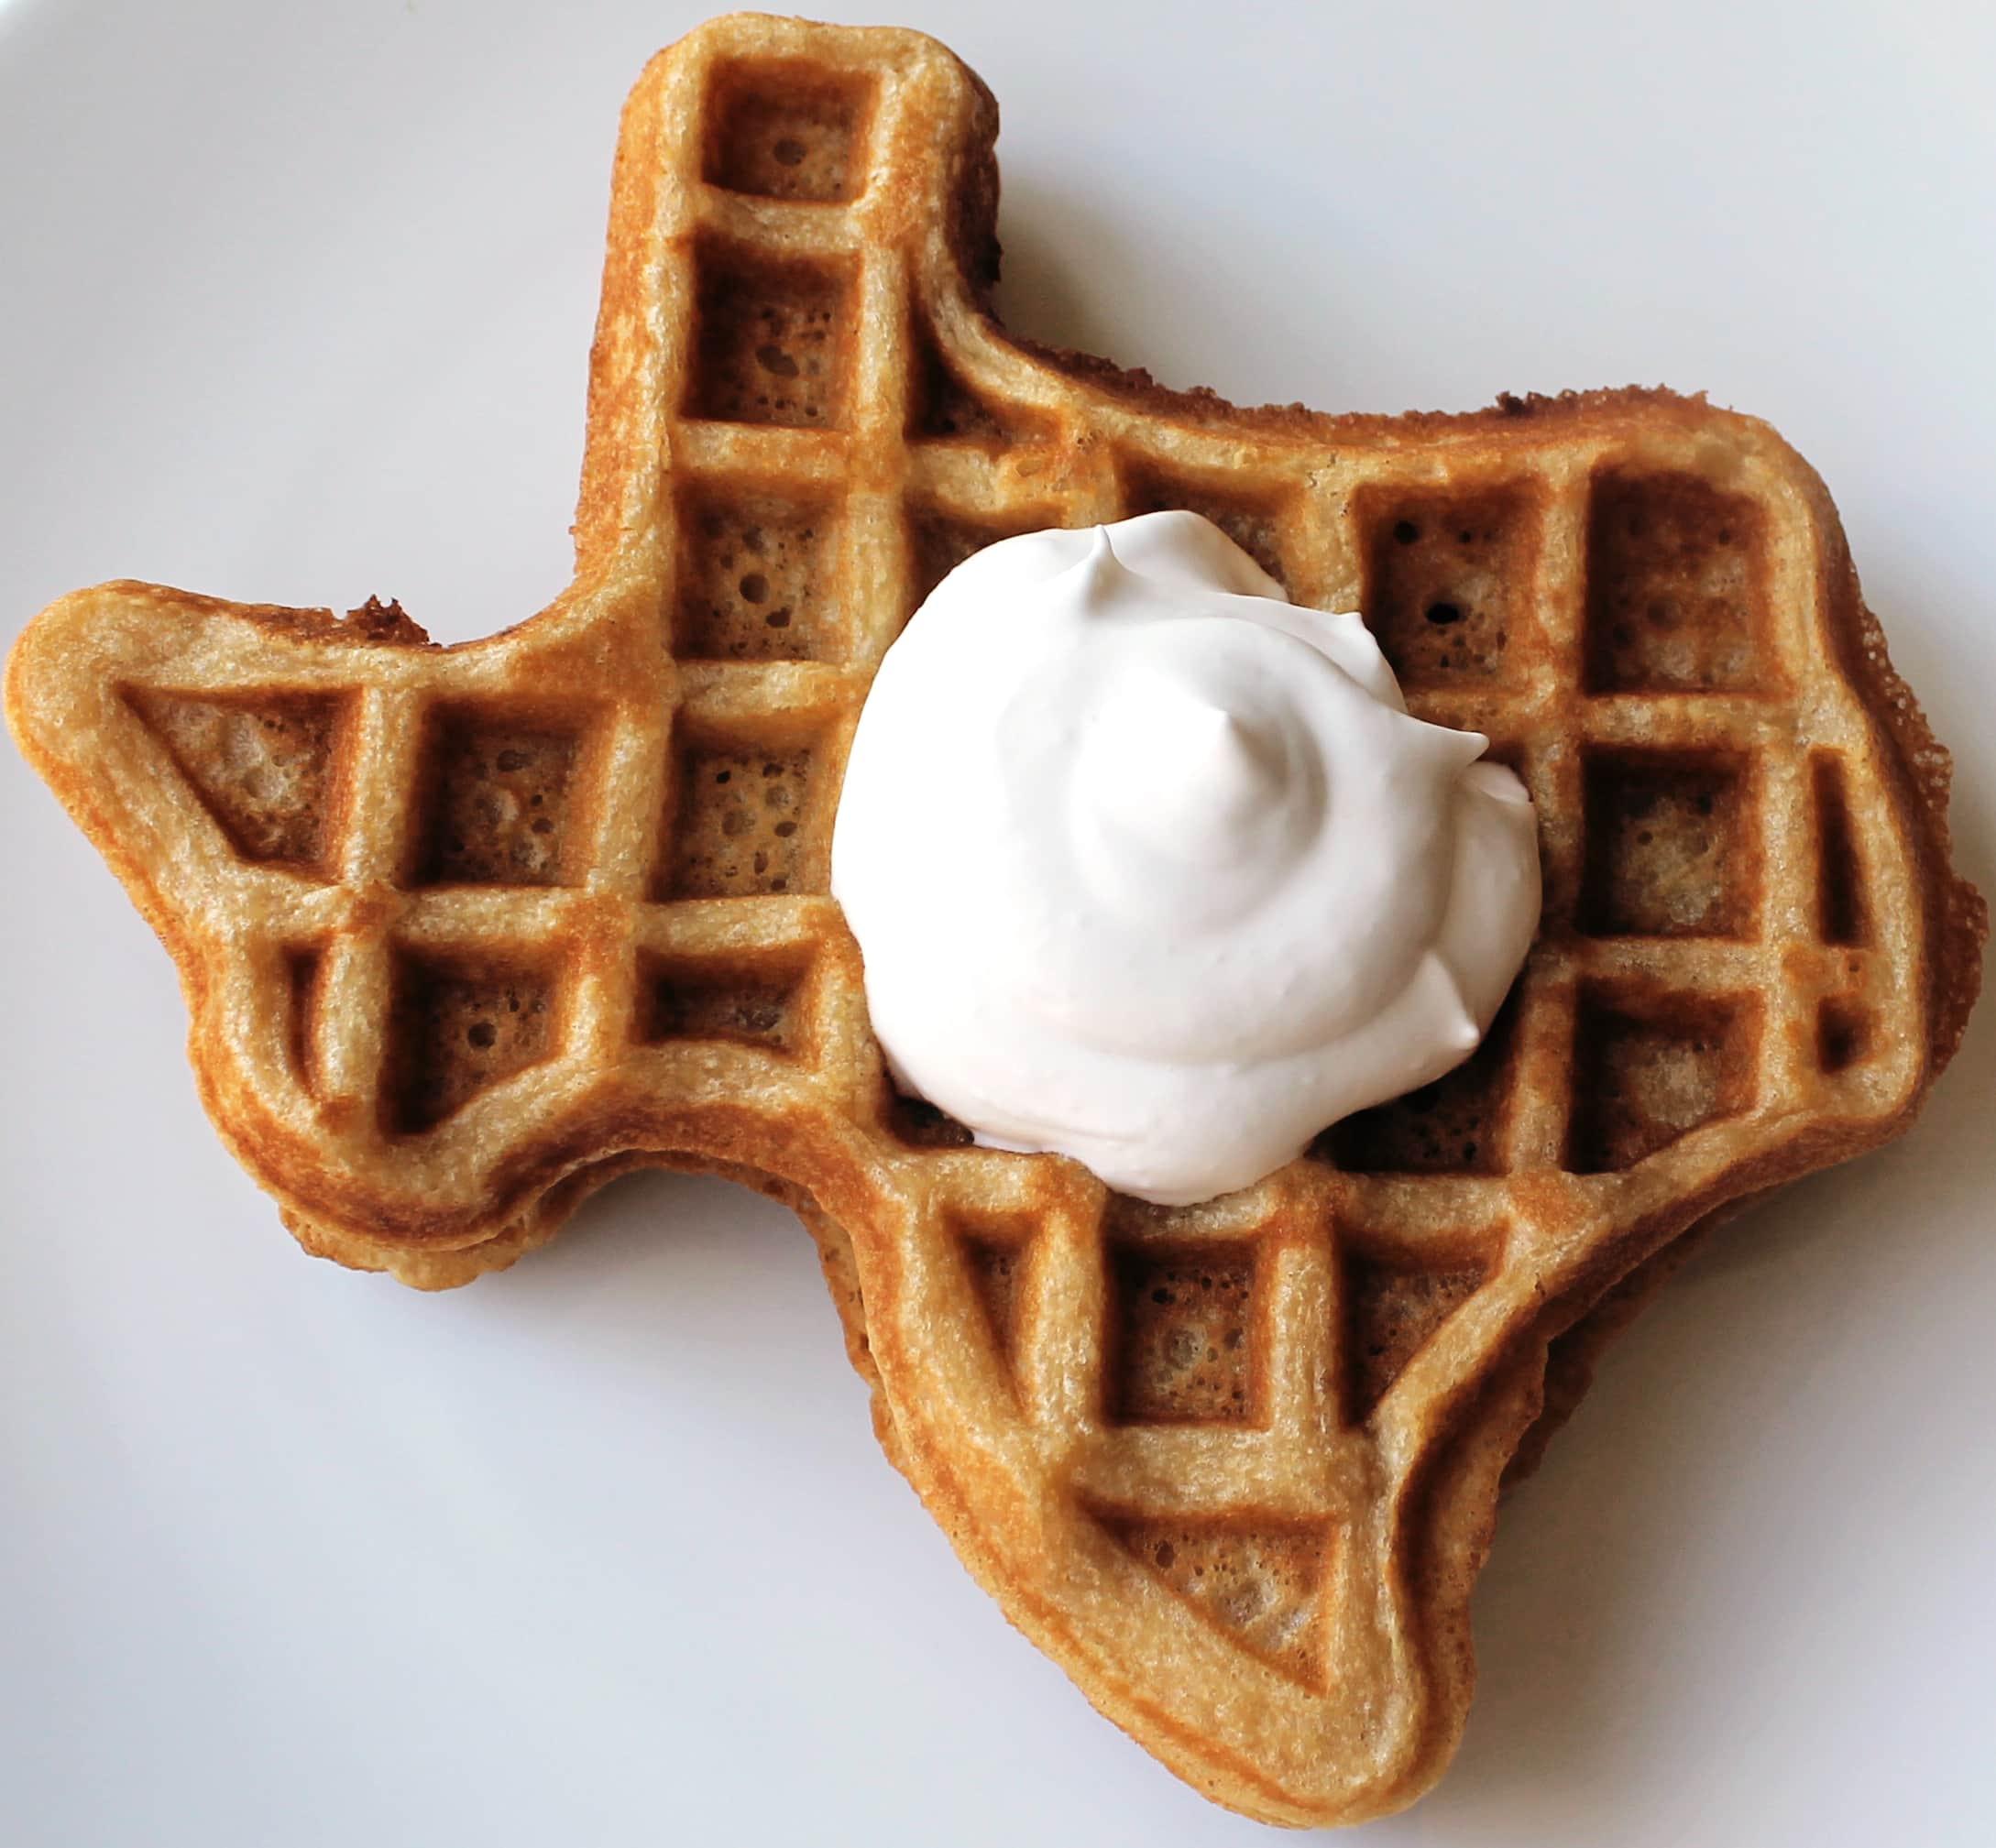 Best Ever Paleo Waffles | Kit's Coastal | #kitscoastal #coastalpaleo #paleo #glutenfree #dairyfree #waffles